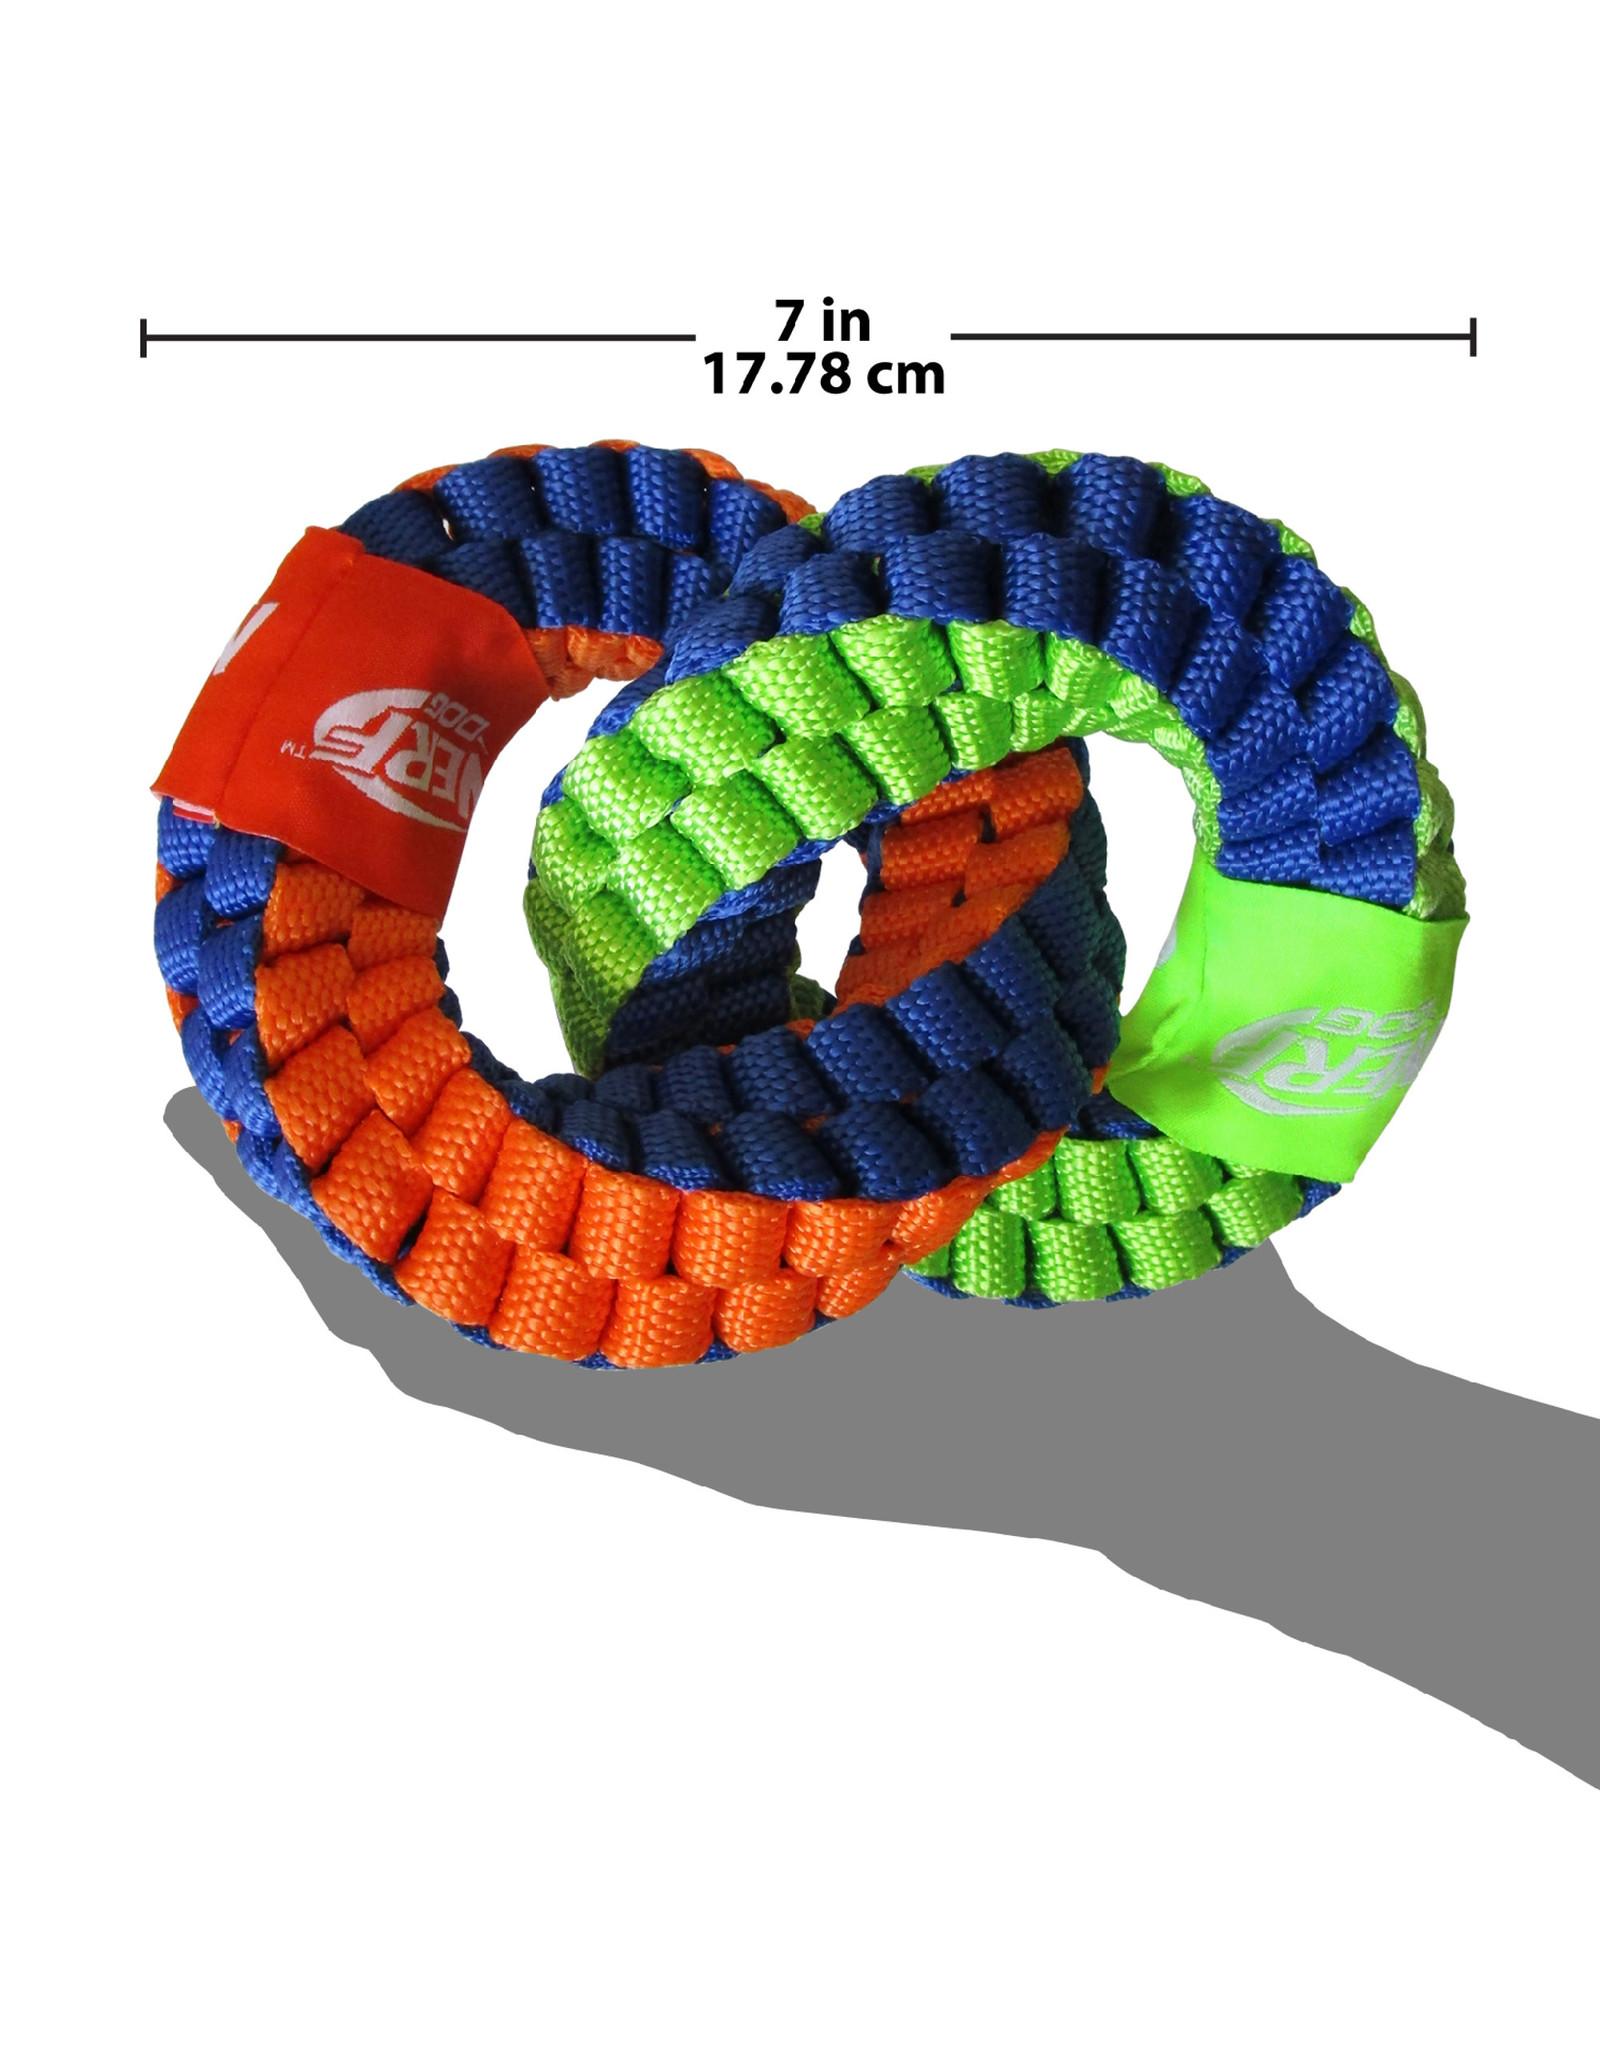 Nerf Nerf Dog Braided Twisted 2-Ring Tug 18cm (7in)